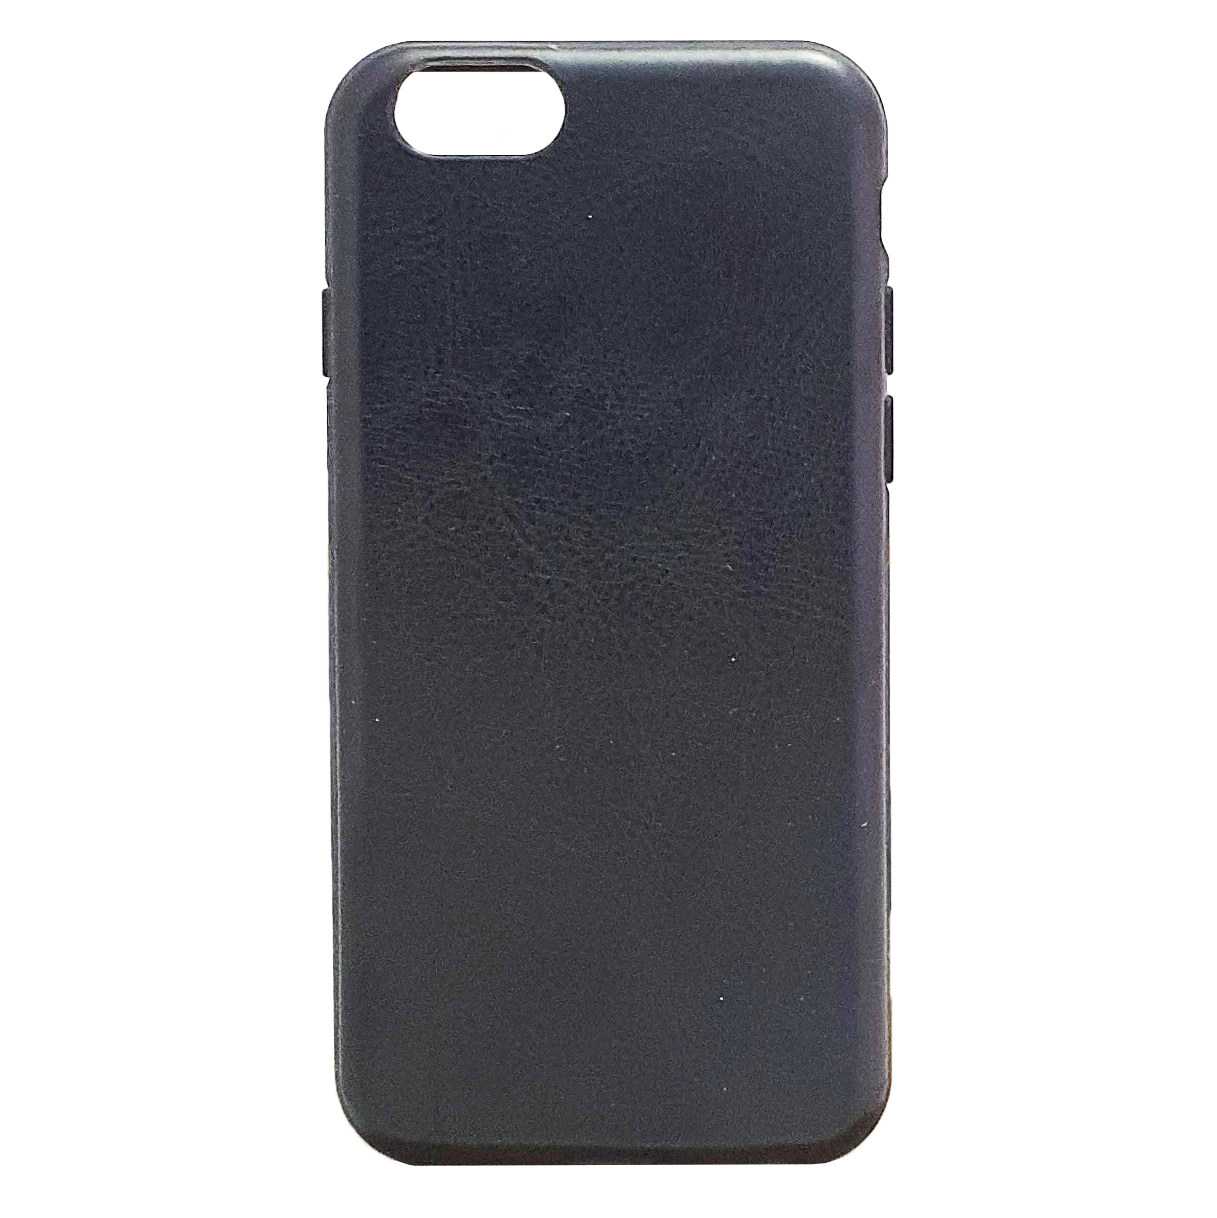 Mobilskal iPhone 6 / 6S Svart Läderfinish